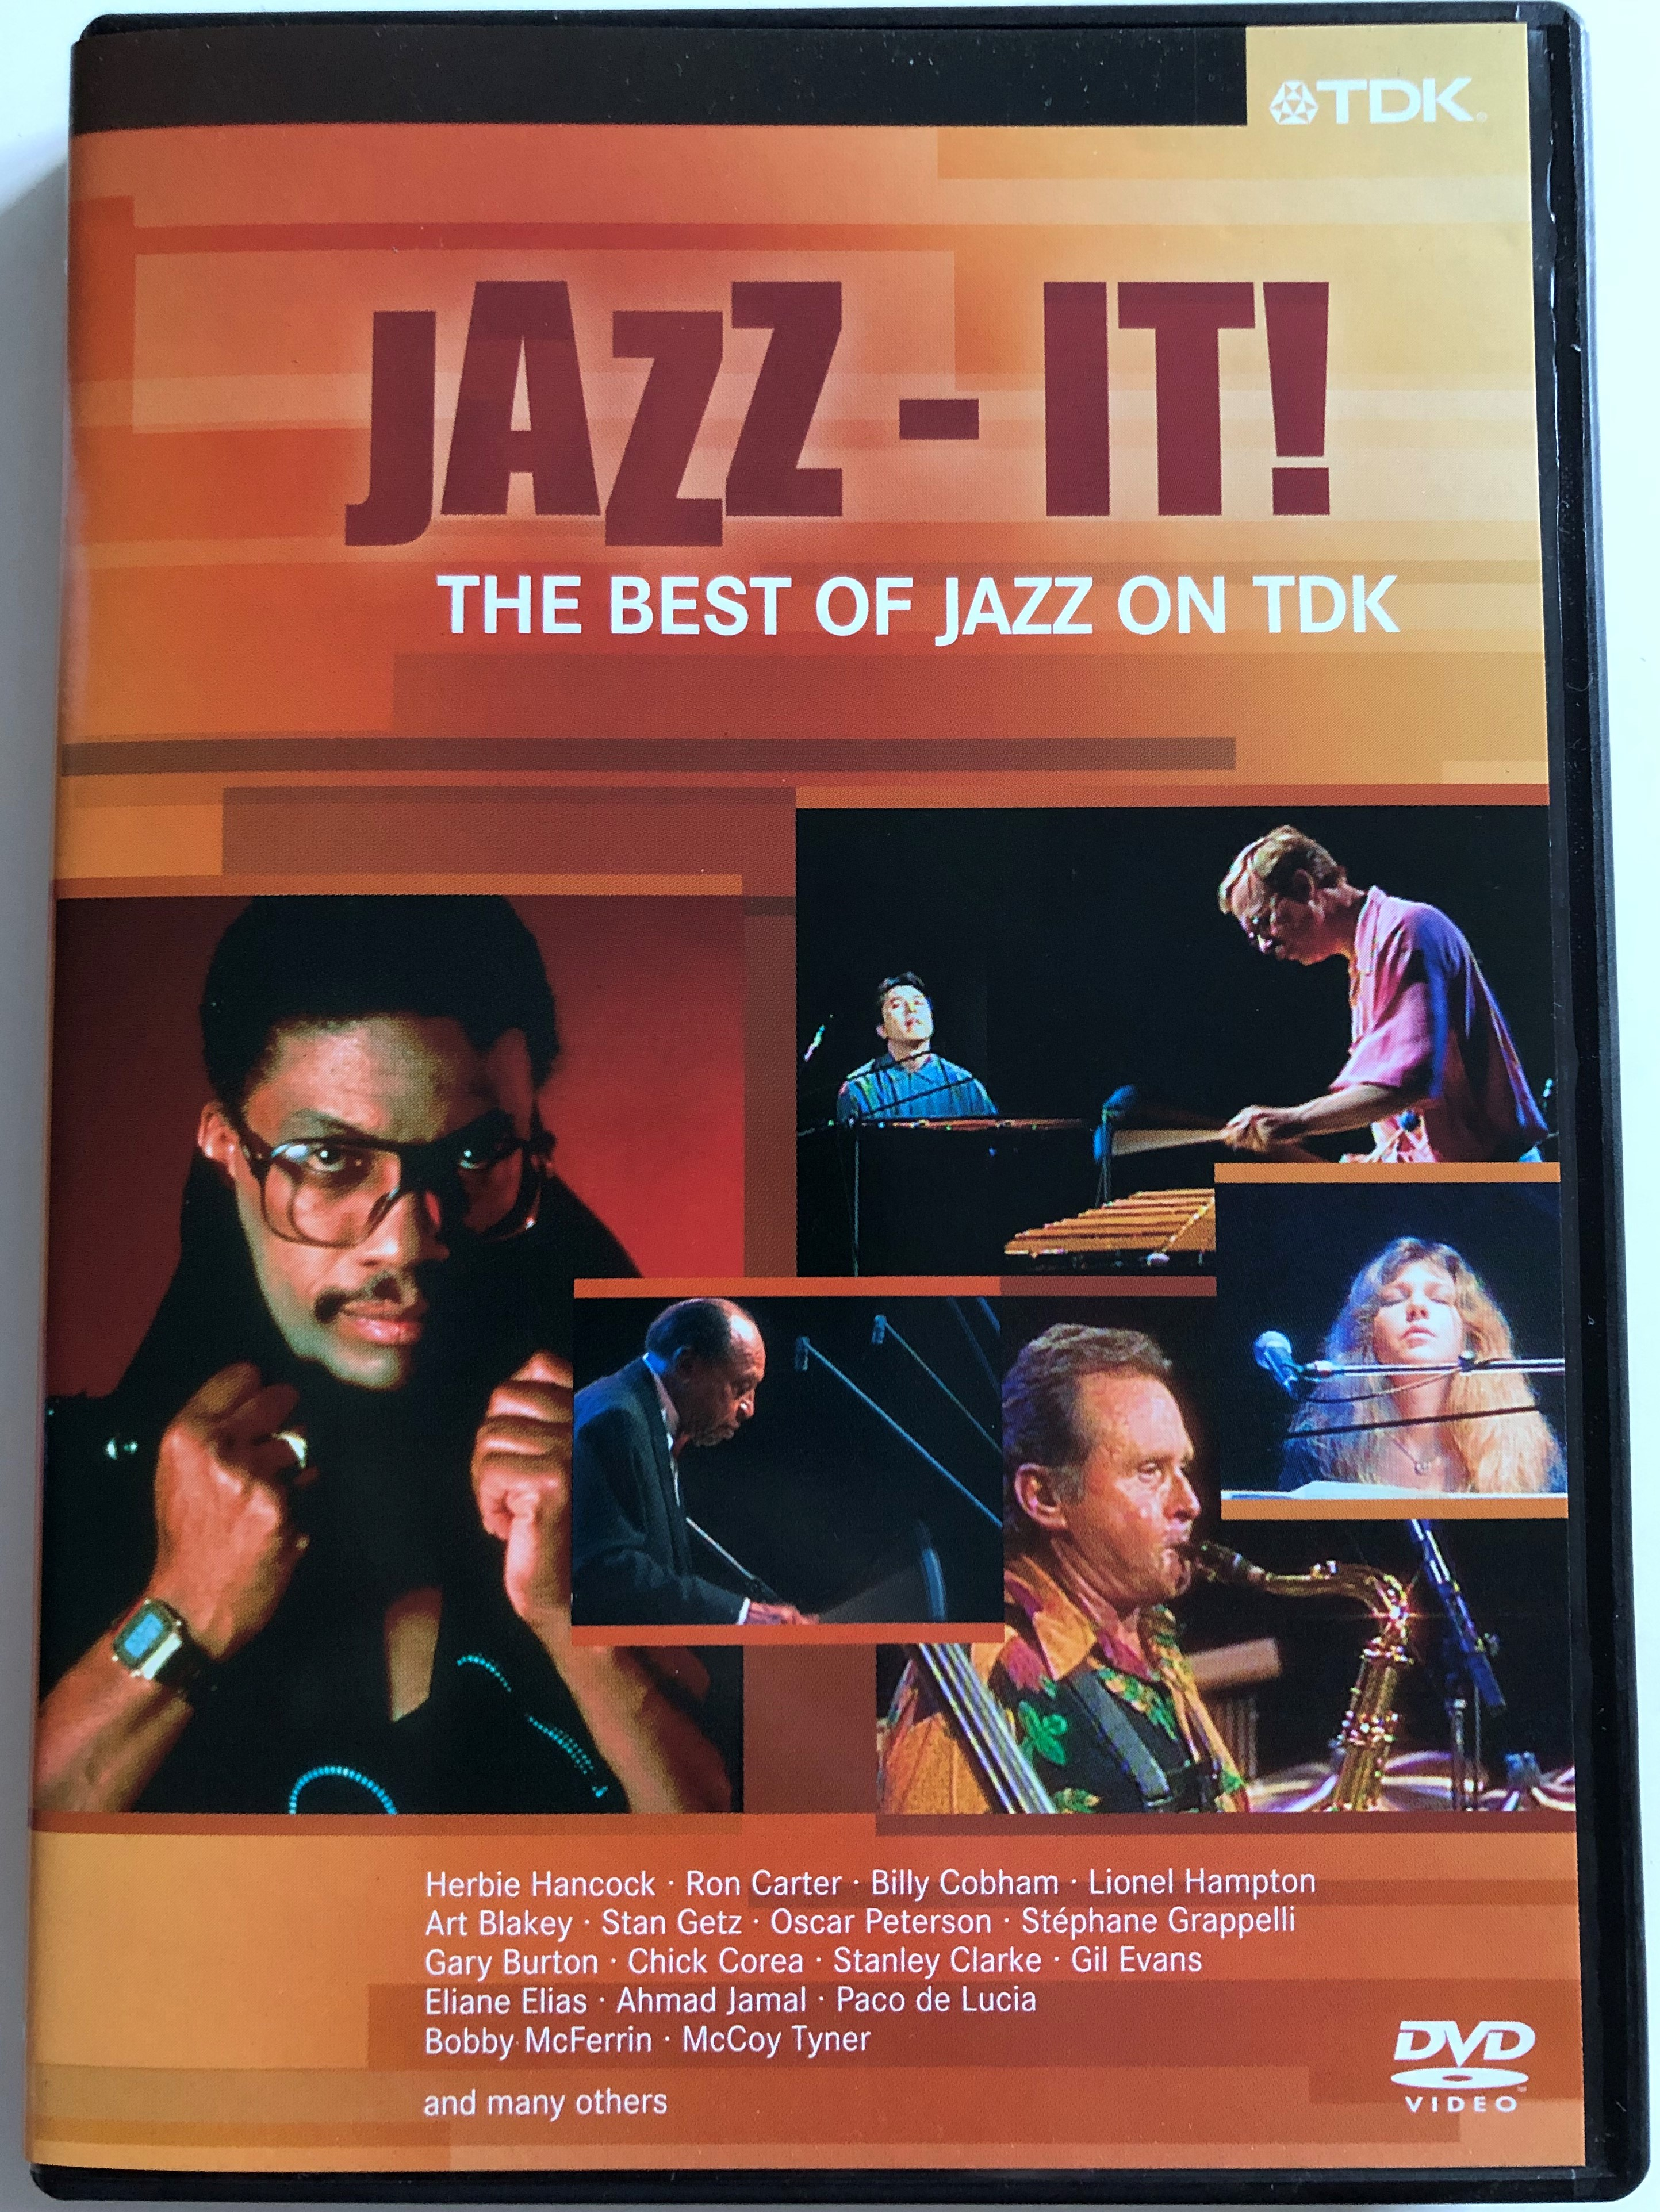 jazz-it-dvd-2003-the-best-of-jazz-on-tdk-herbie-hancock-ron-carter-stan-getz-oscar-peterson-gil-evans-mccoy-tyner-dv-jsmpl1-1-.jpg